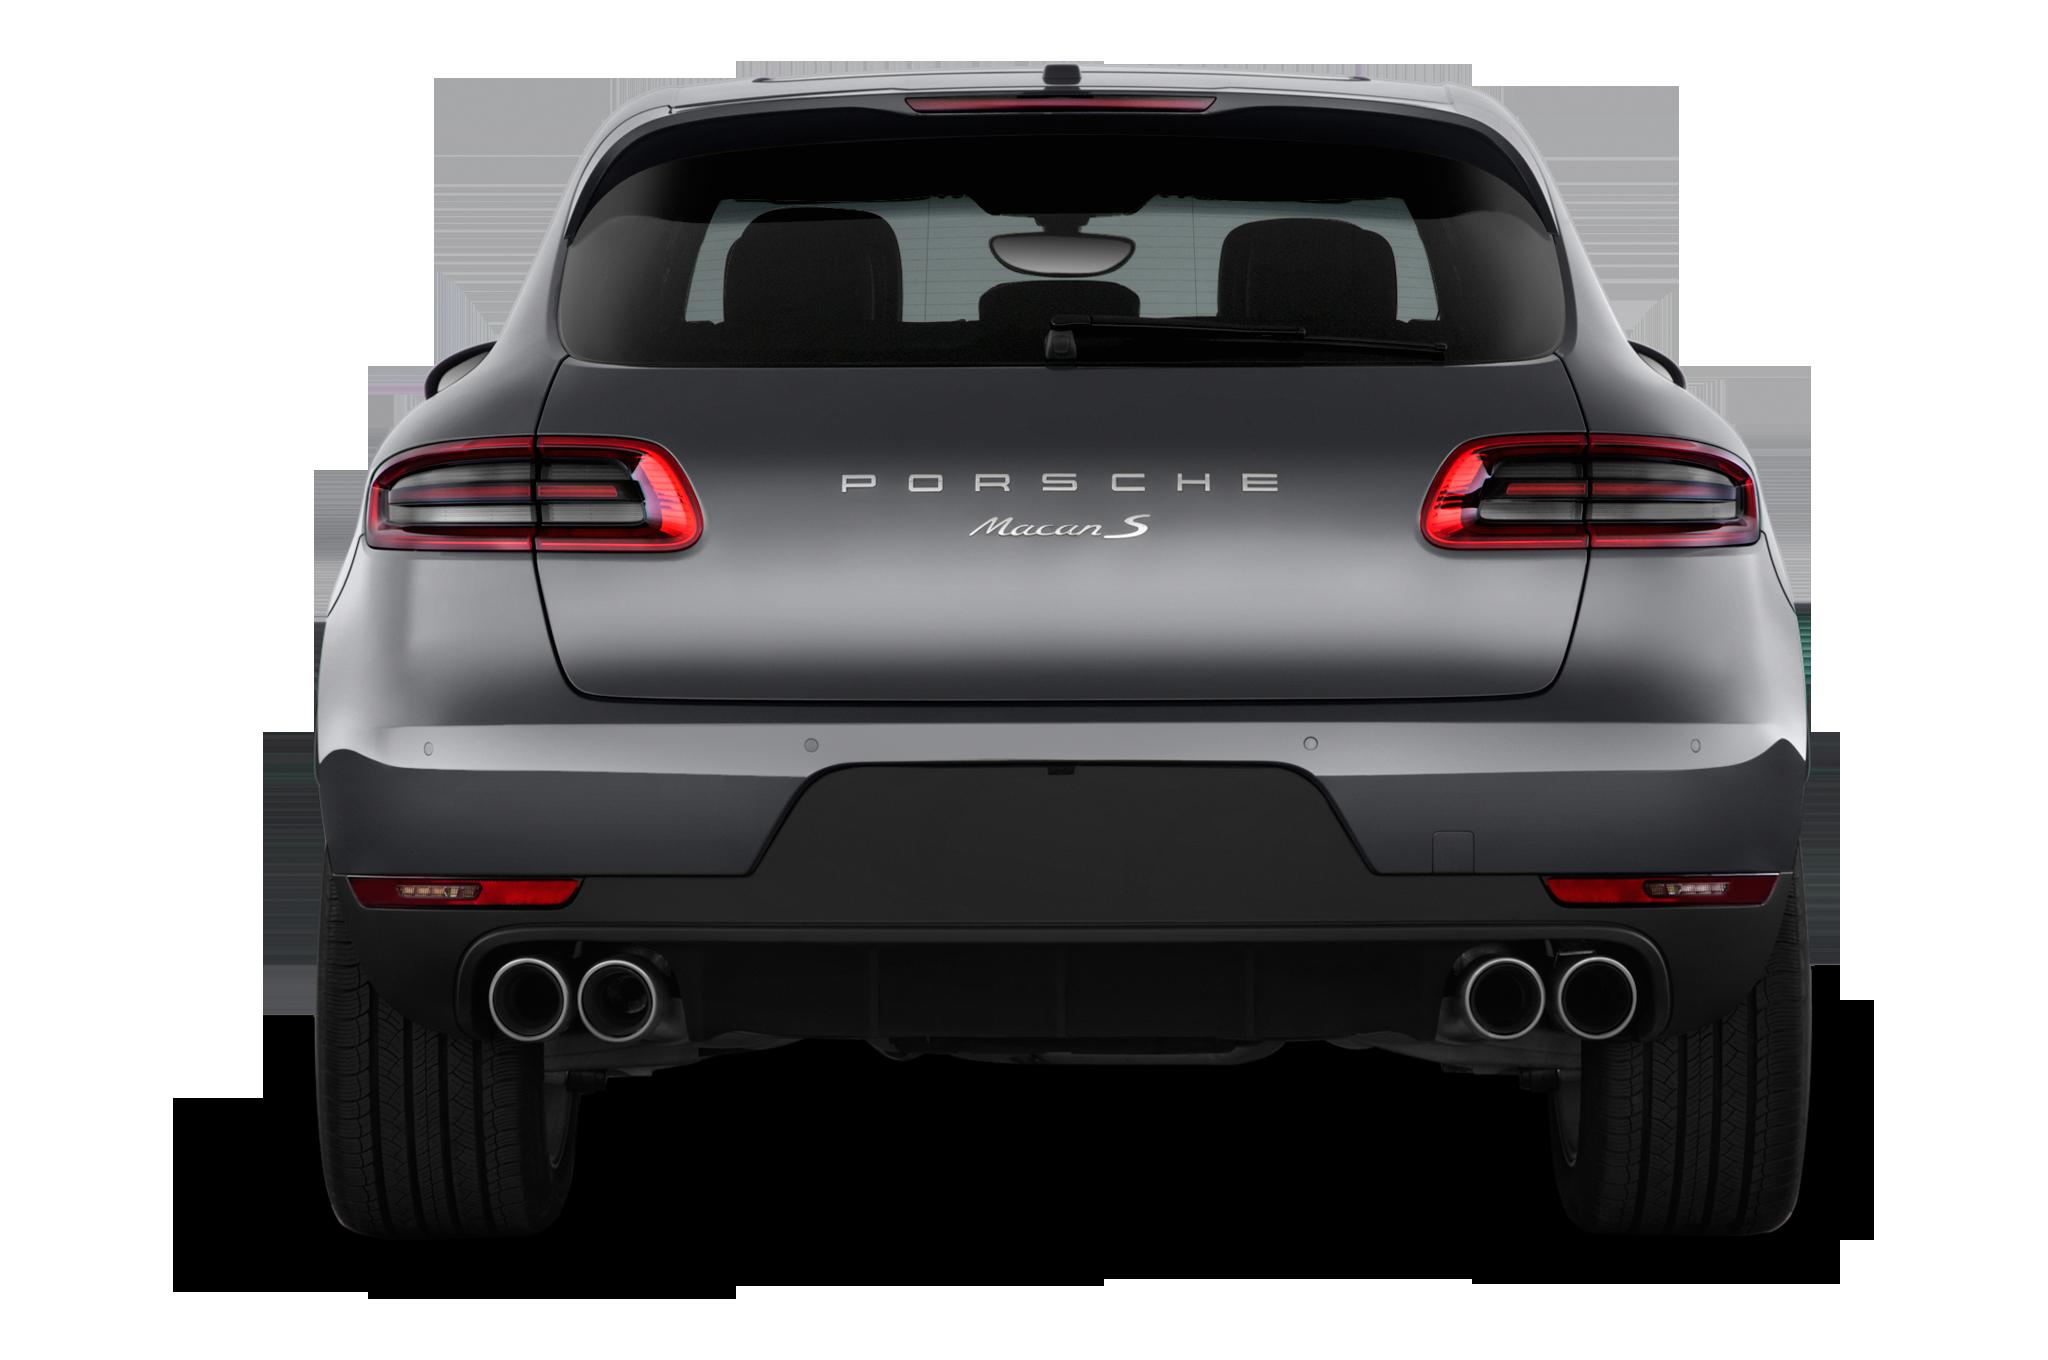 2017 porsche macan adds 252-hp turbo-four base model   automobile